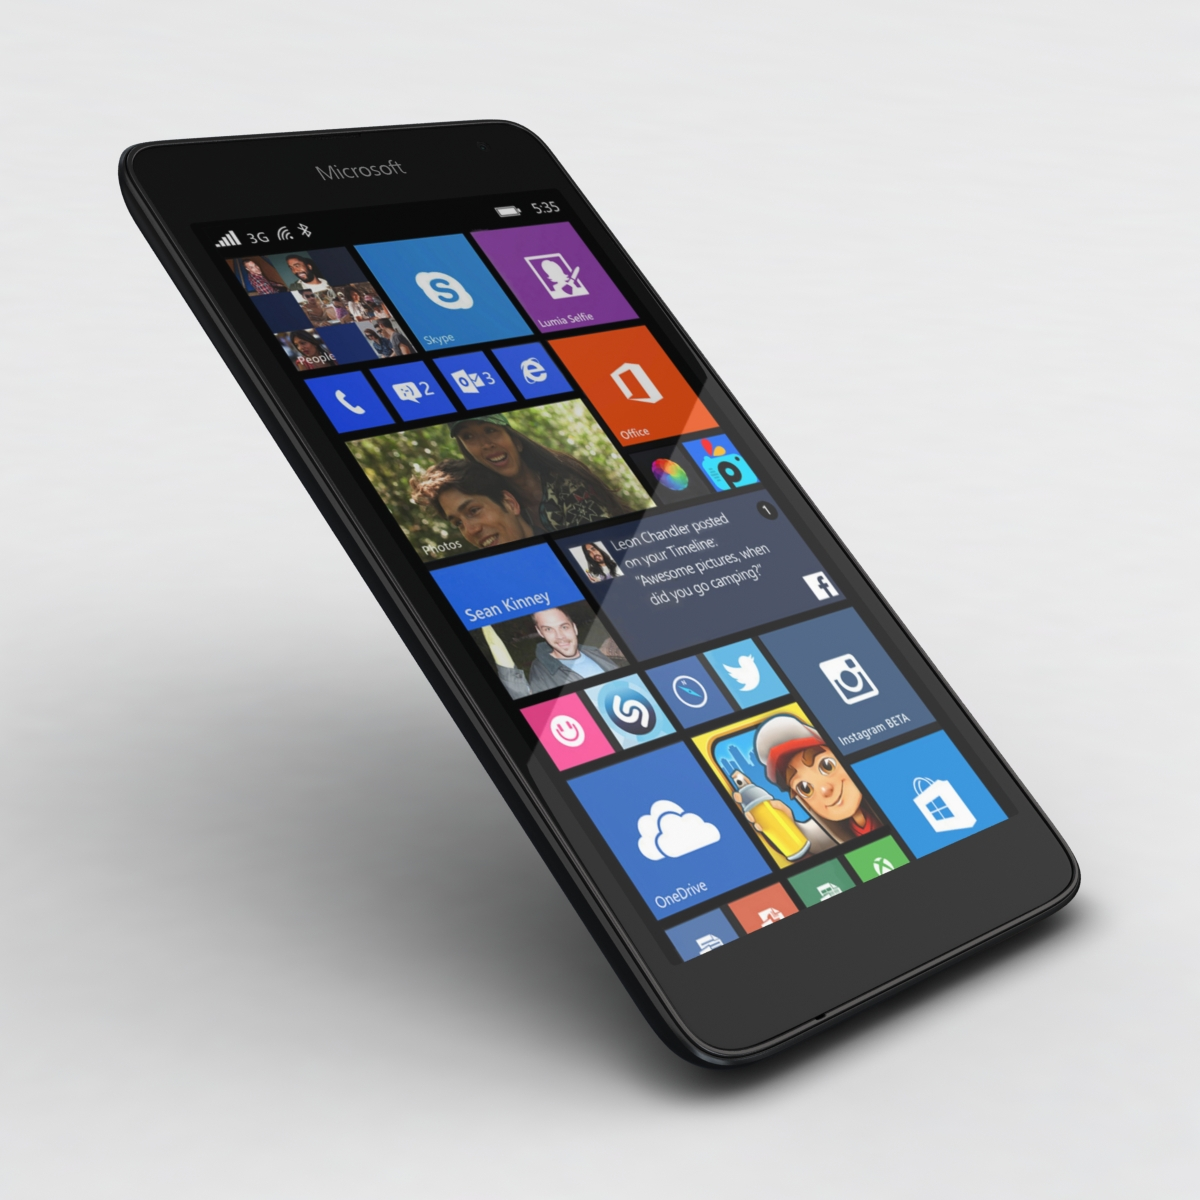 microsoft lumia 535 and dual sim black 3d model 3ds max fbx c4d obj 204361